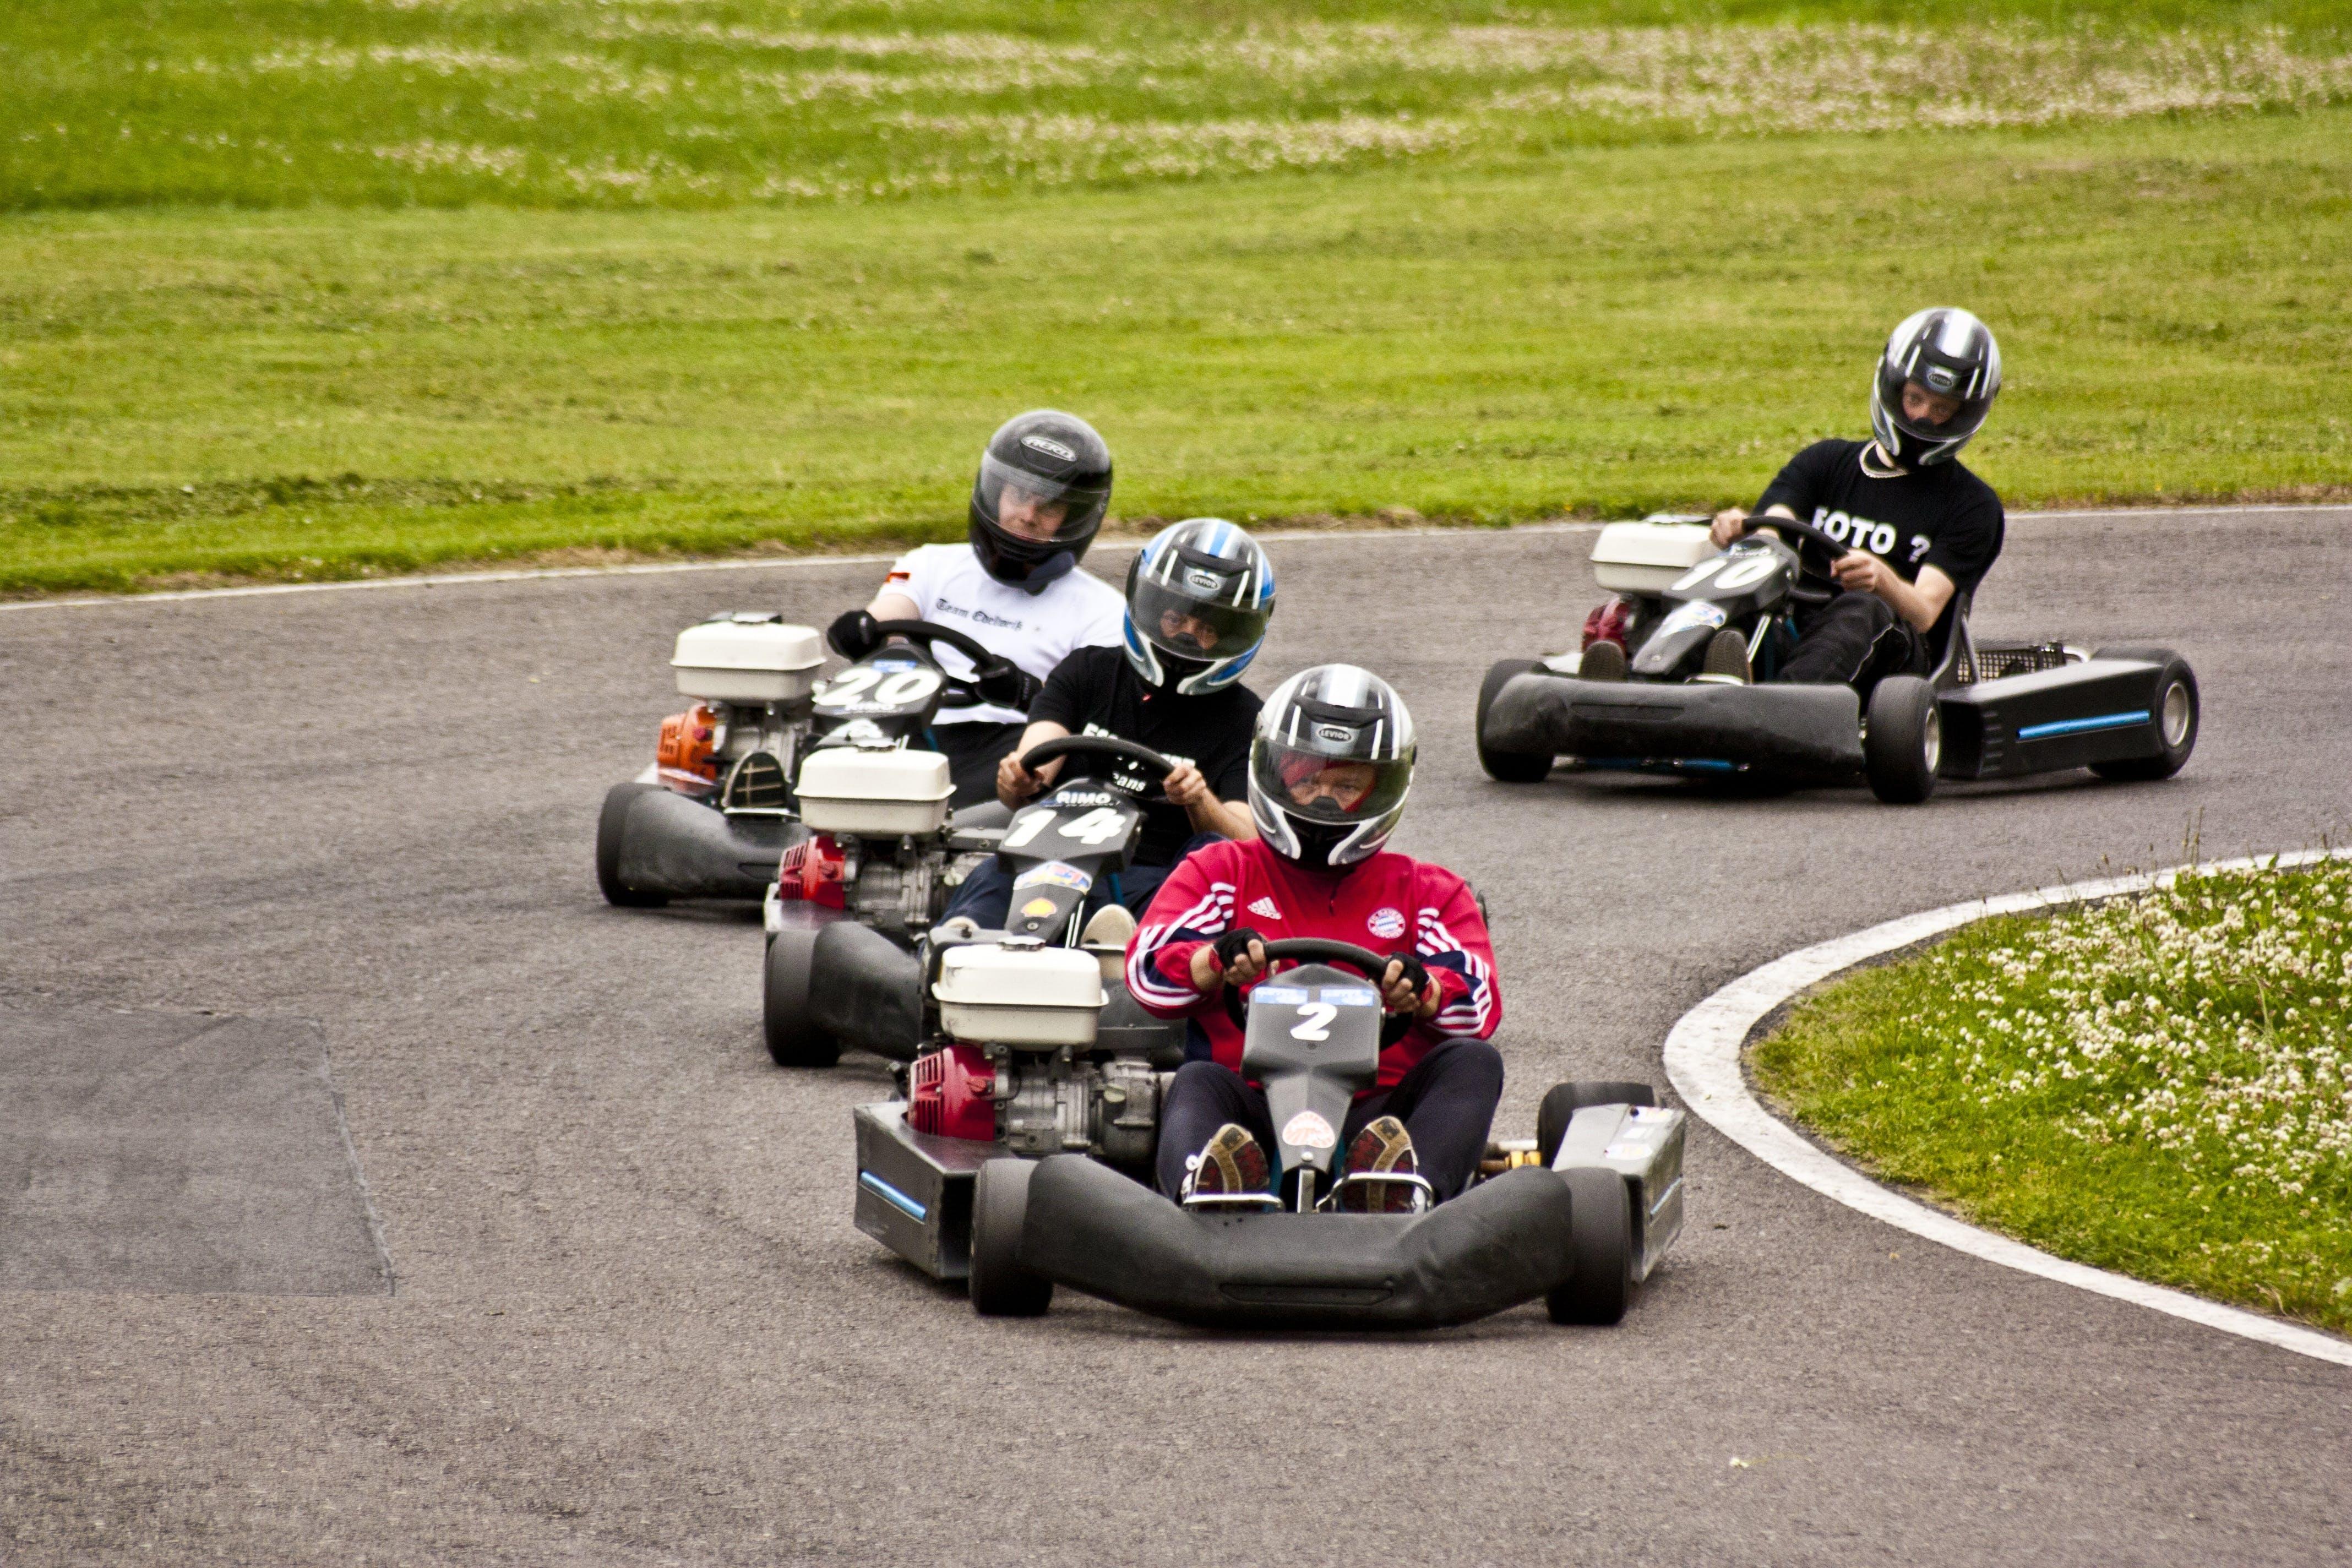 Free stock photo of motorsport, race, race track, karting